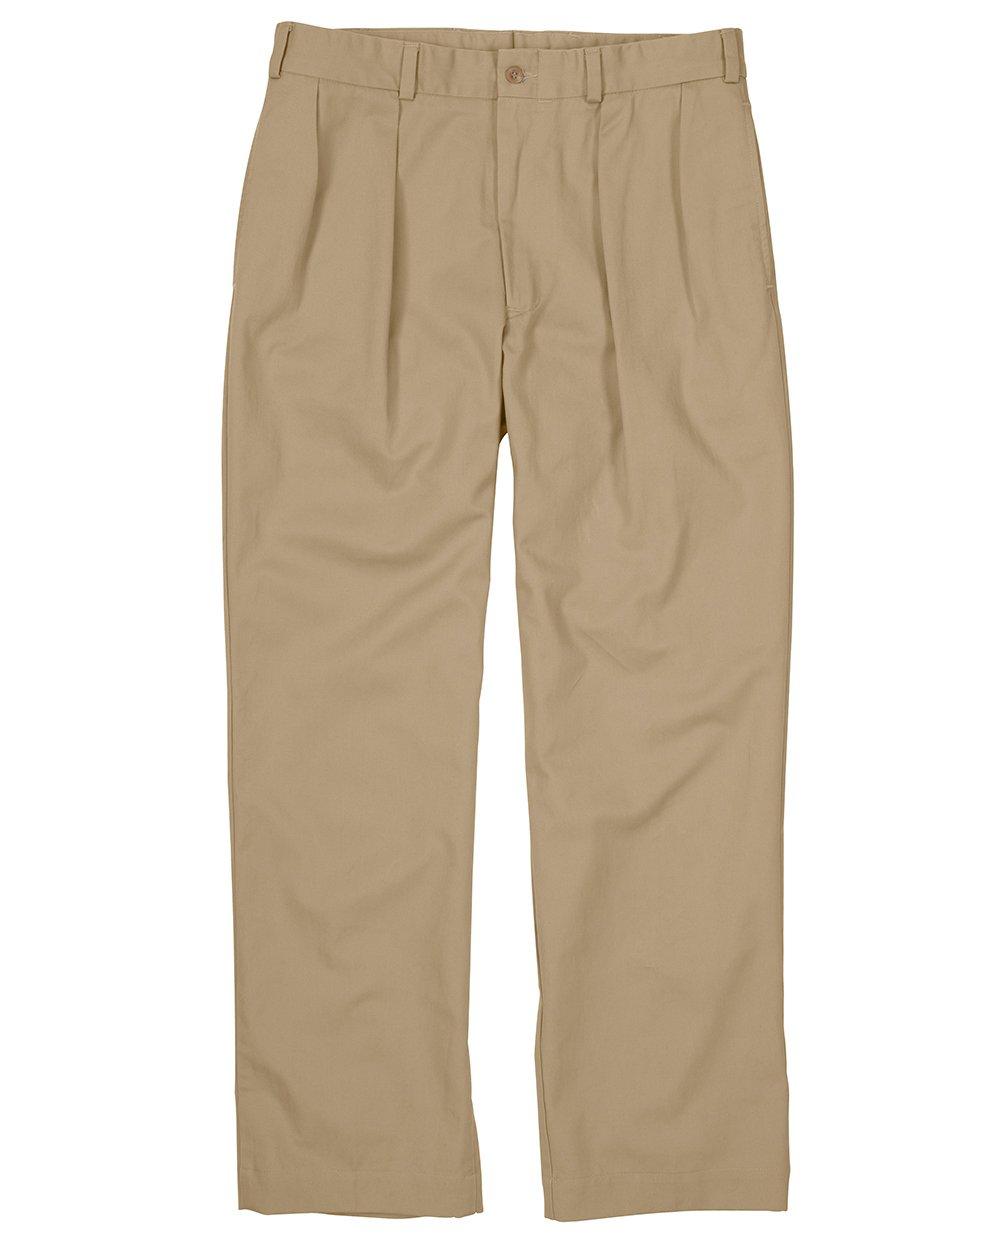 Bill's Khakis M2 Pleated Style (40, Khaki)